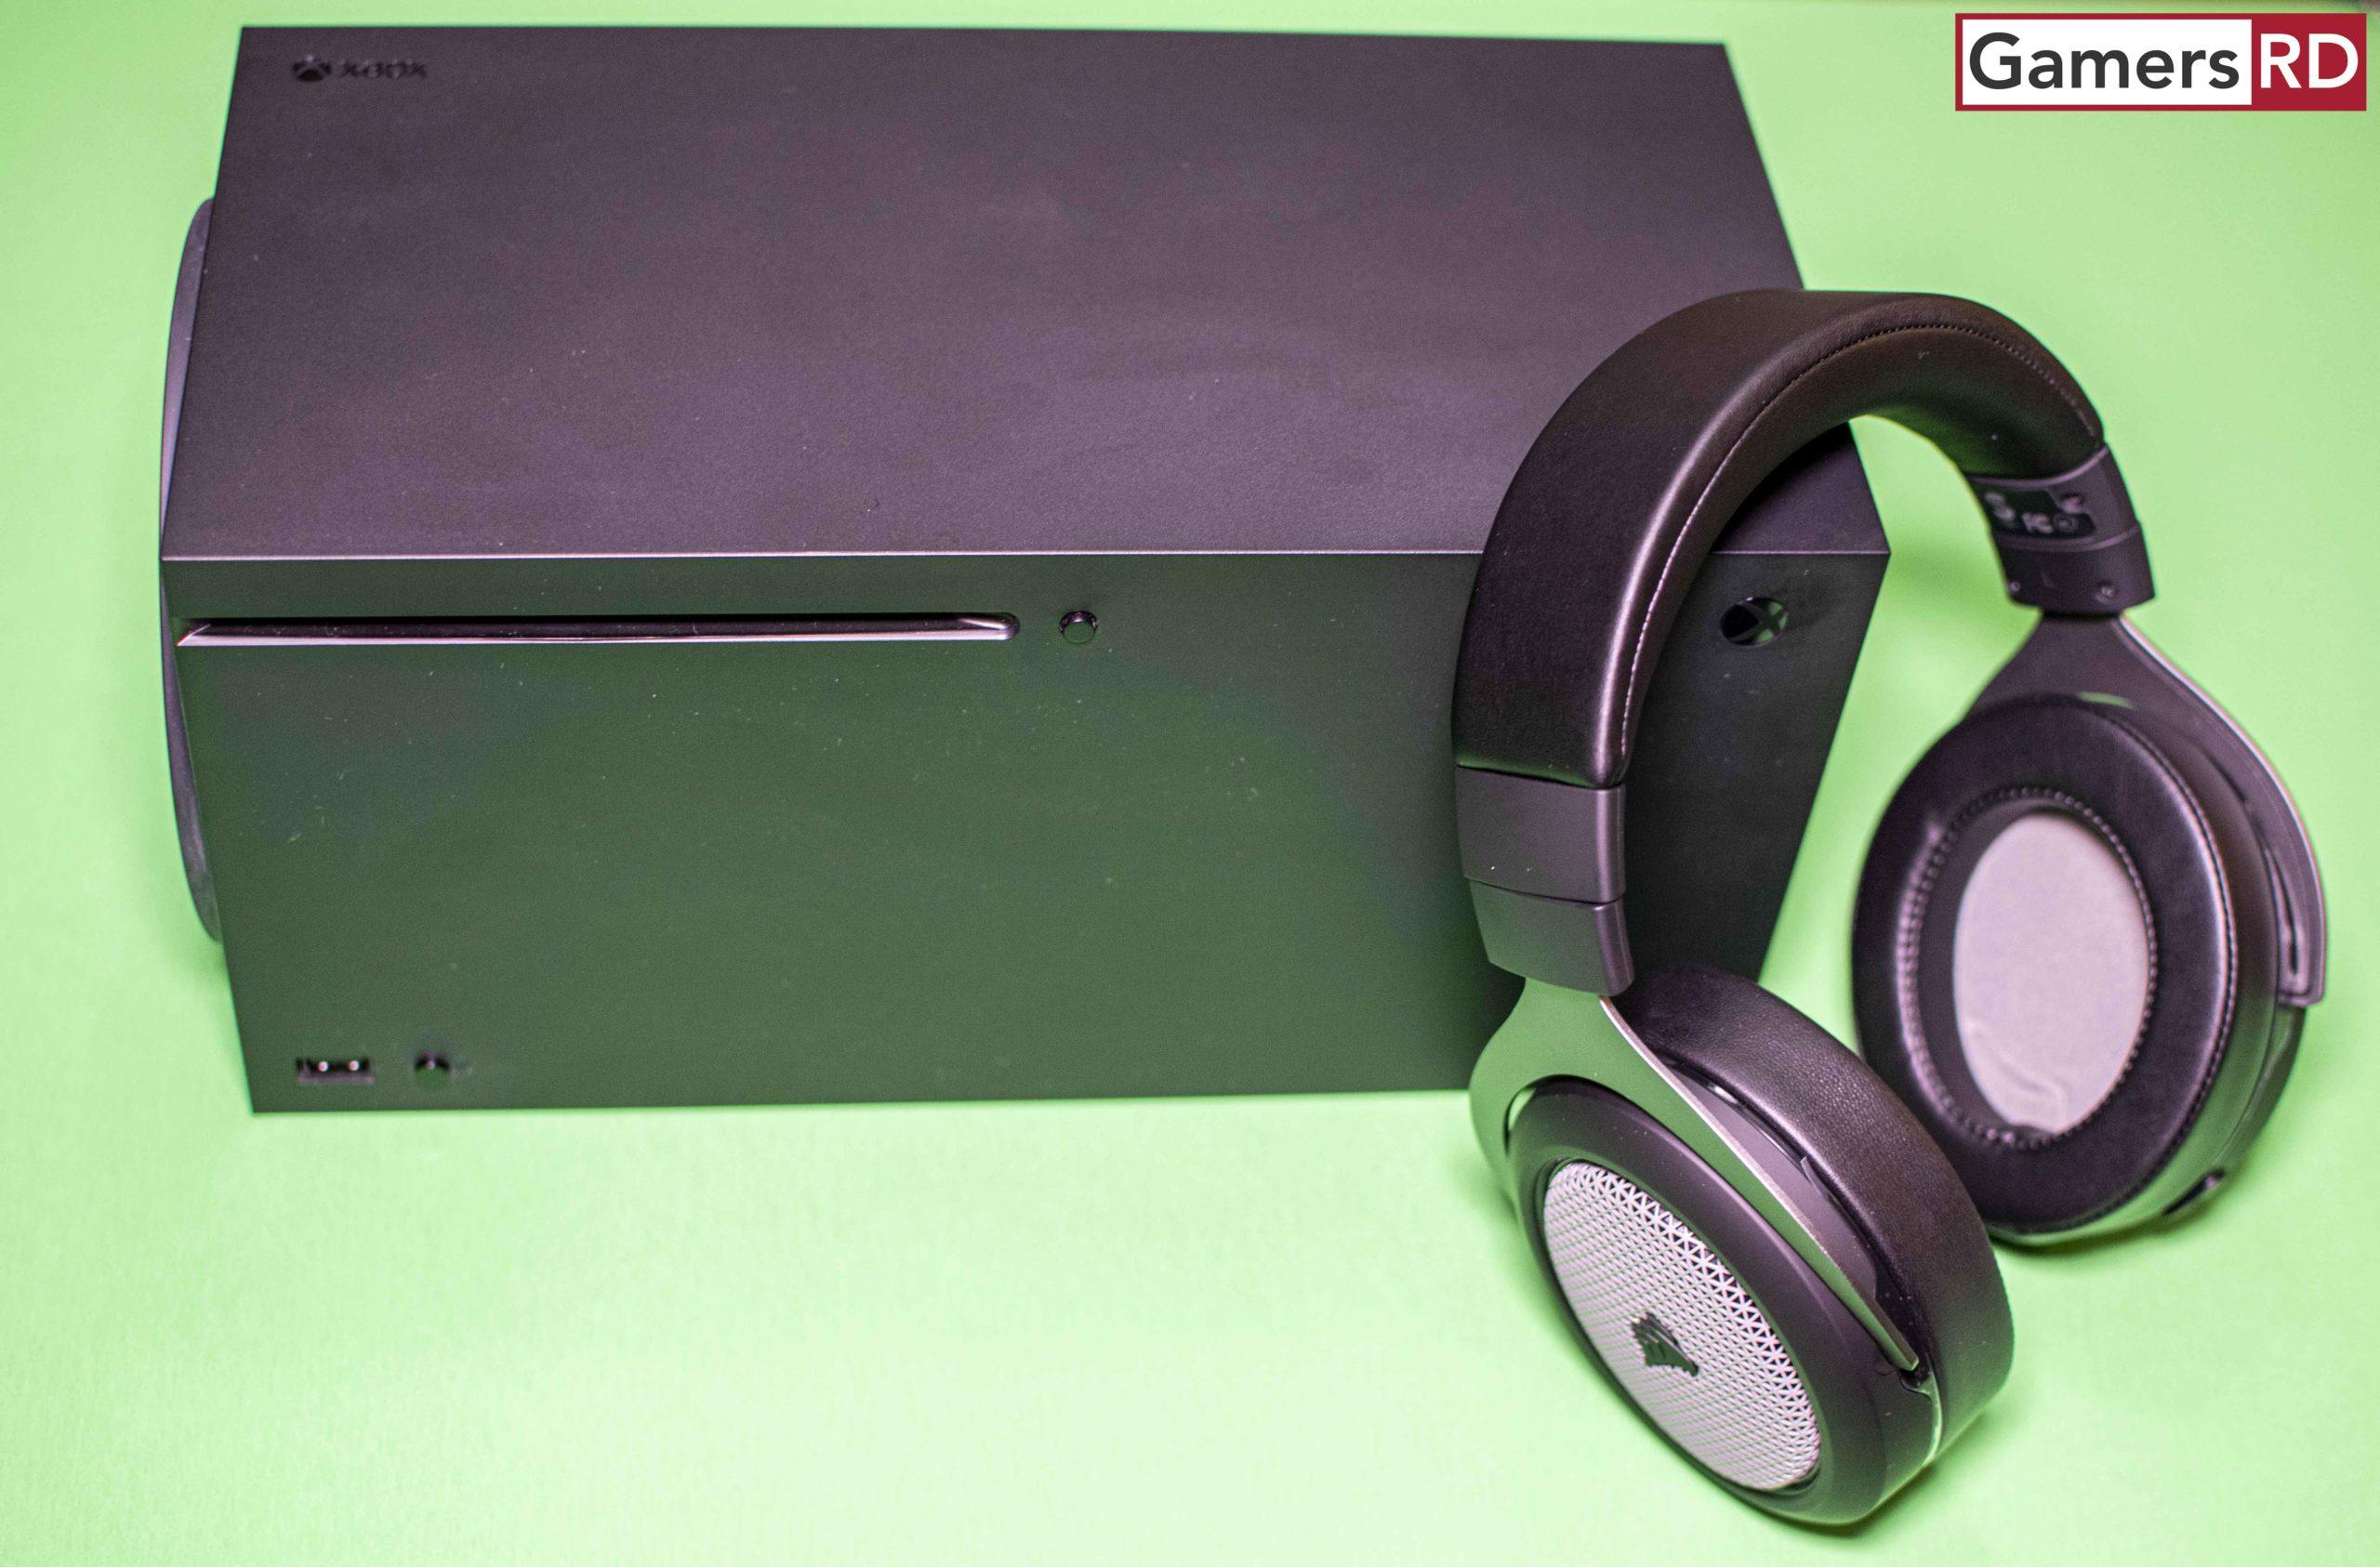 CORSAIR HS 75 XB Headset review, 8 GamersRD